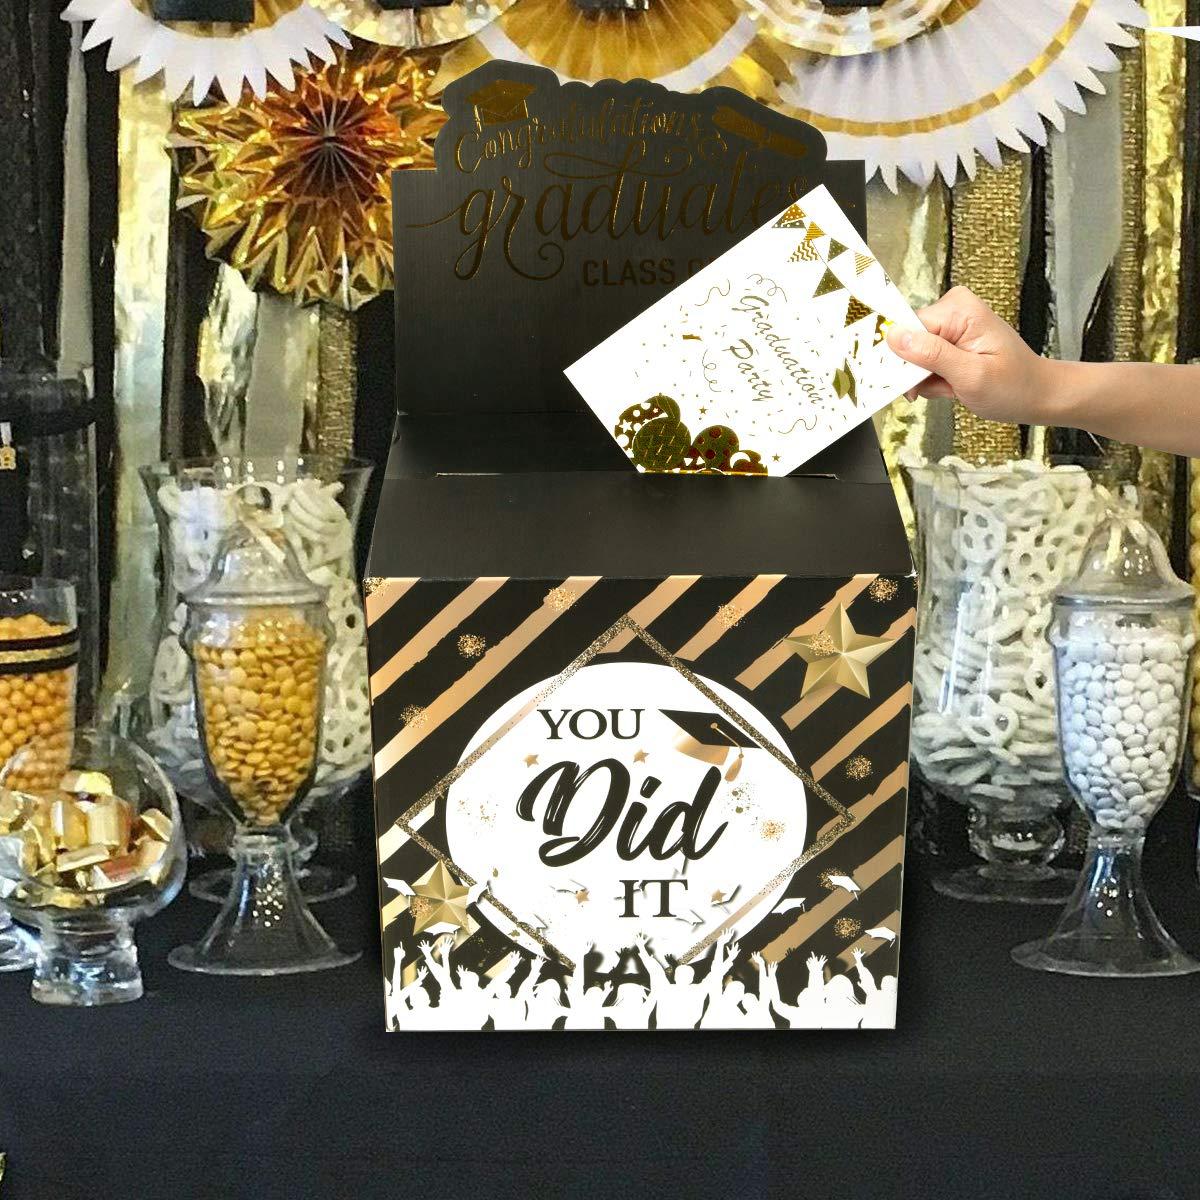 Graduation Card Box Holder - Graduation 2019 Party Favor Durable Supplies - You Did It & Adventures Begins Party Decorations